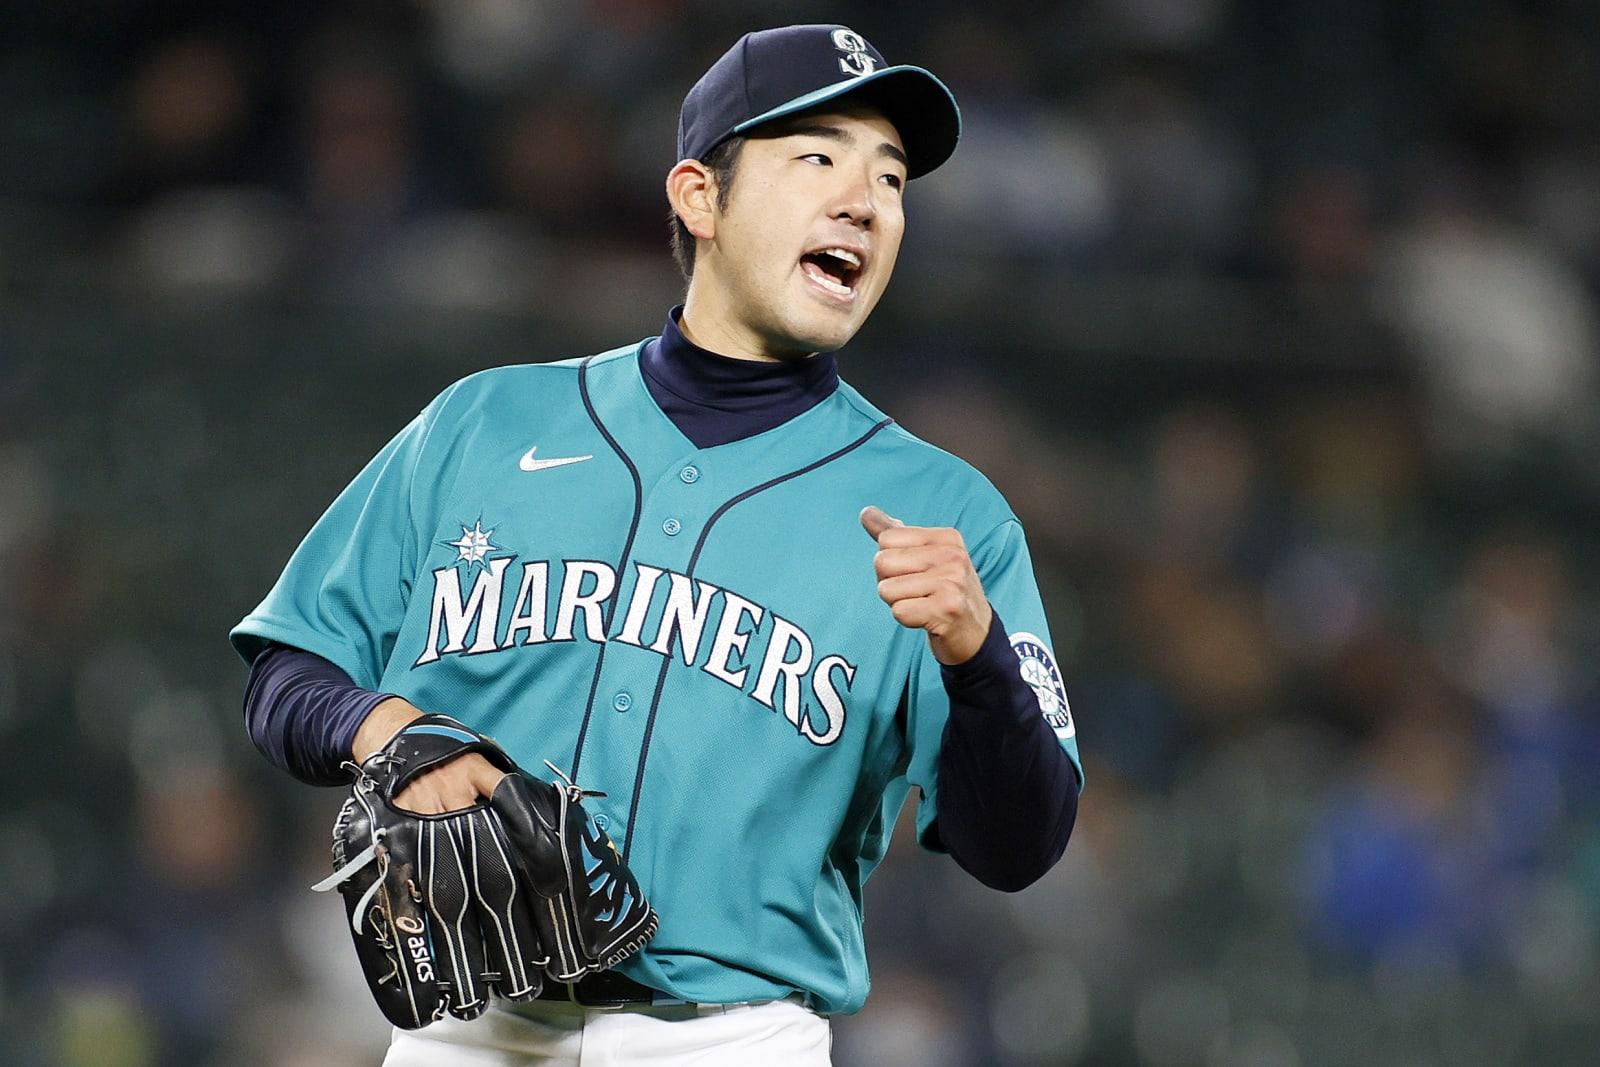 Yusei Kikuchi of the Mariners against the Giants.